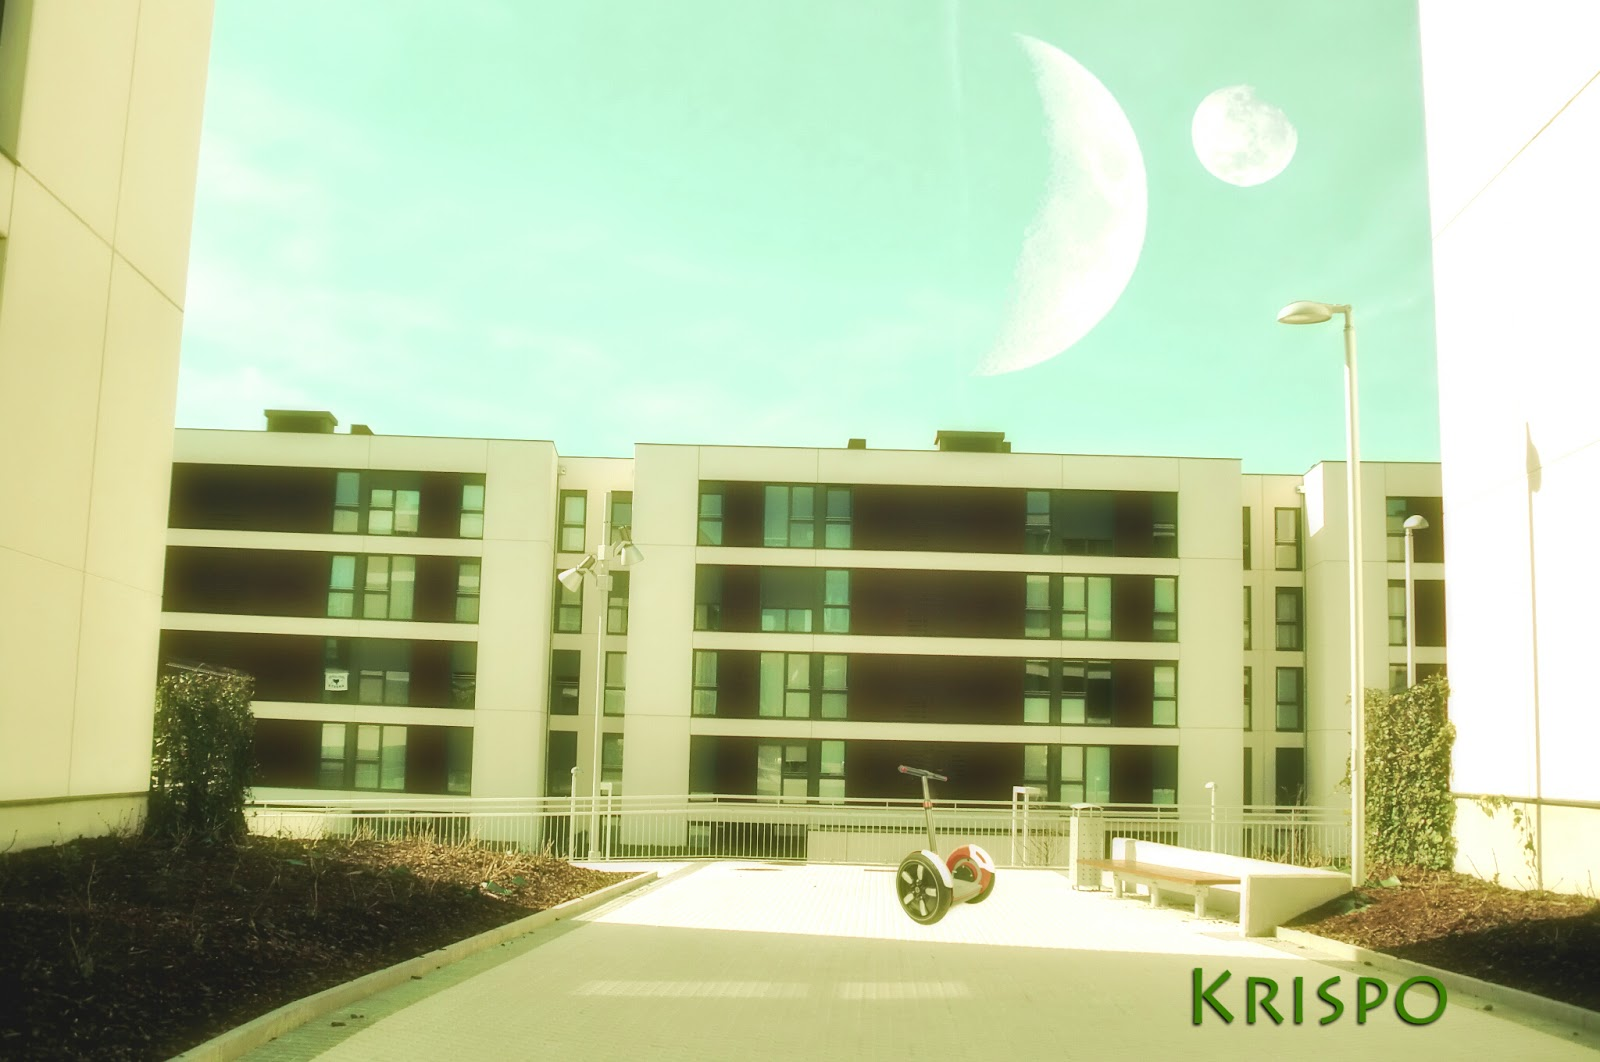 fotomontaje con dos lunas